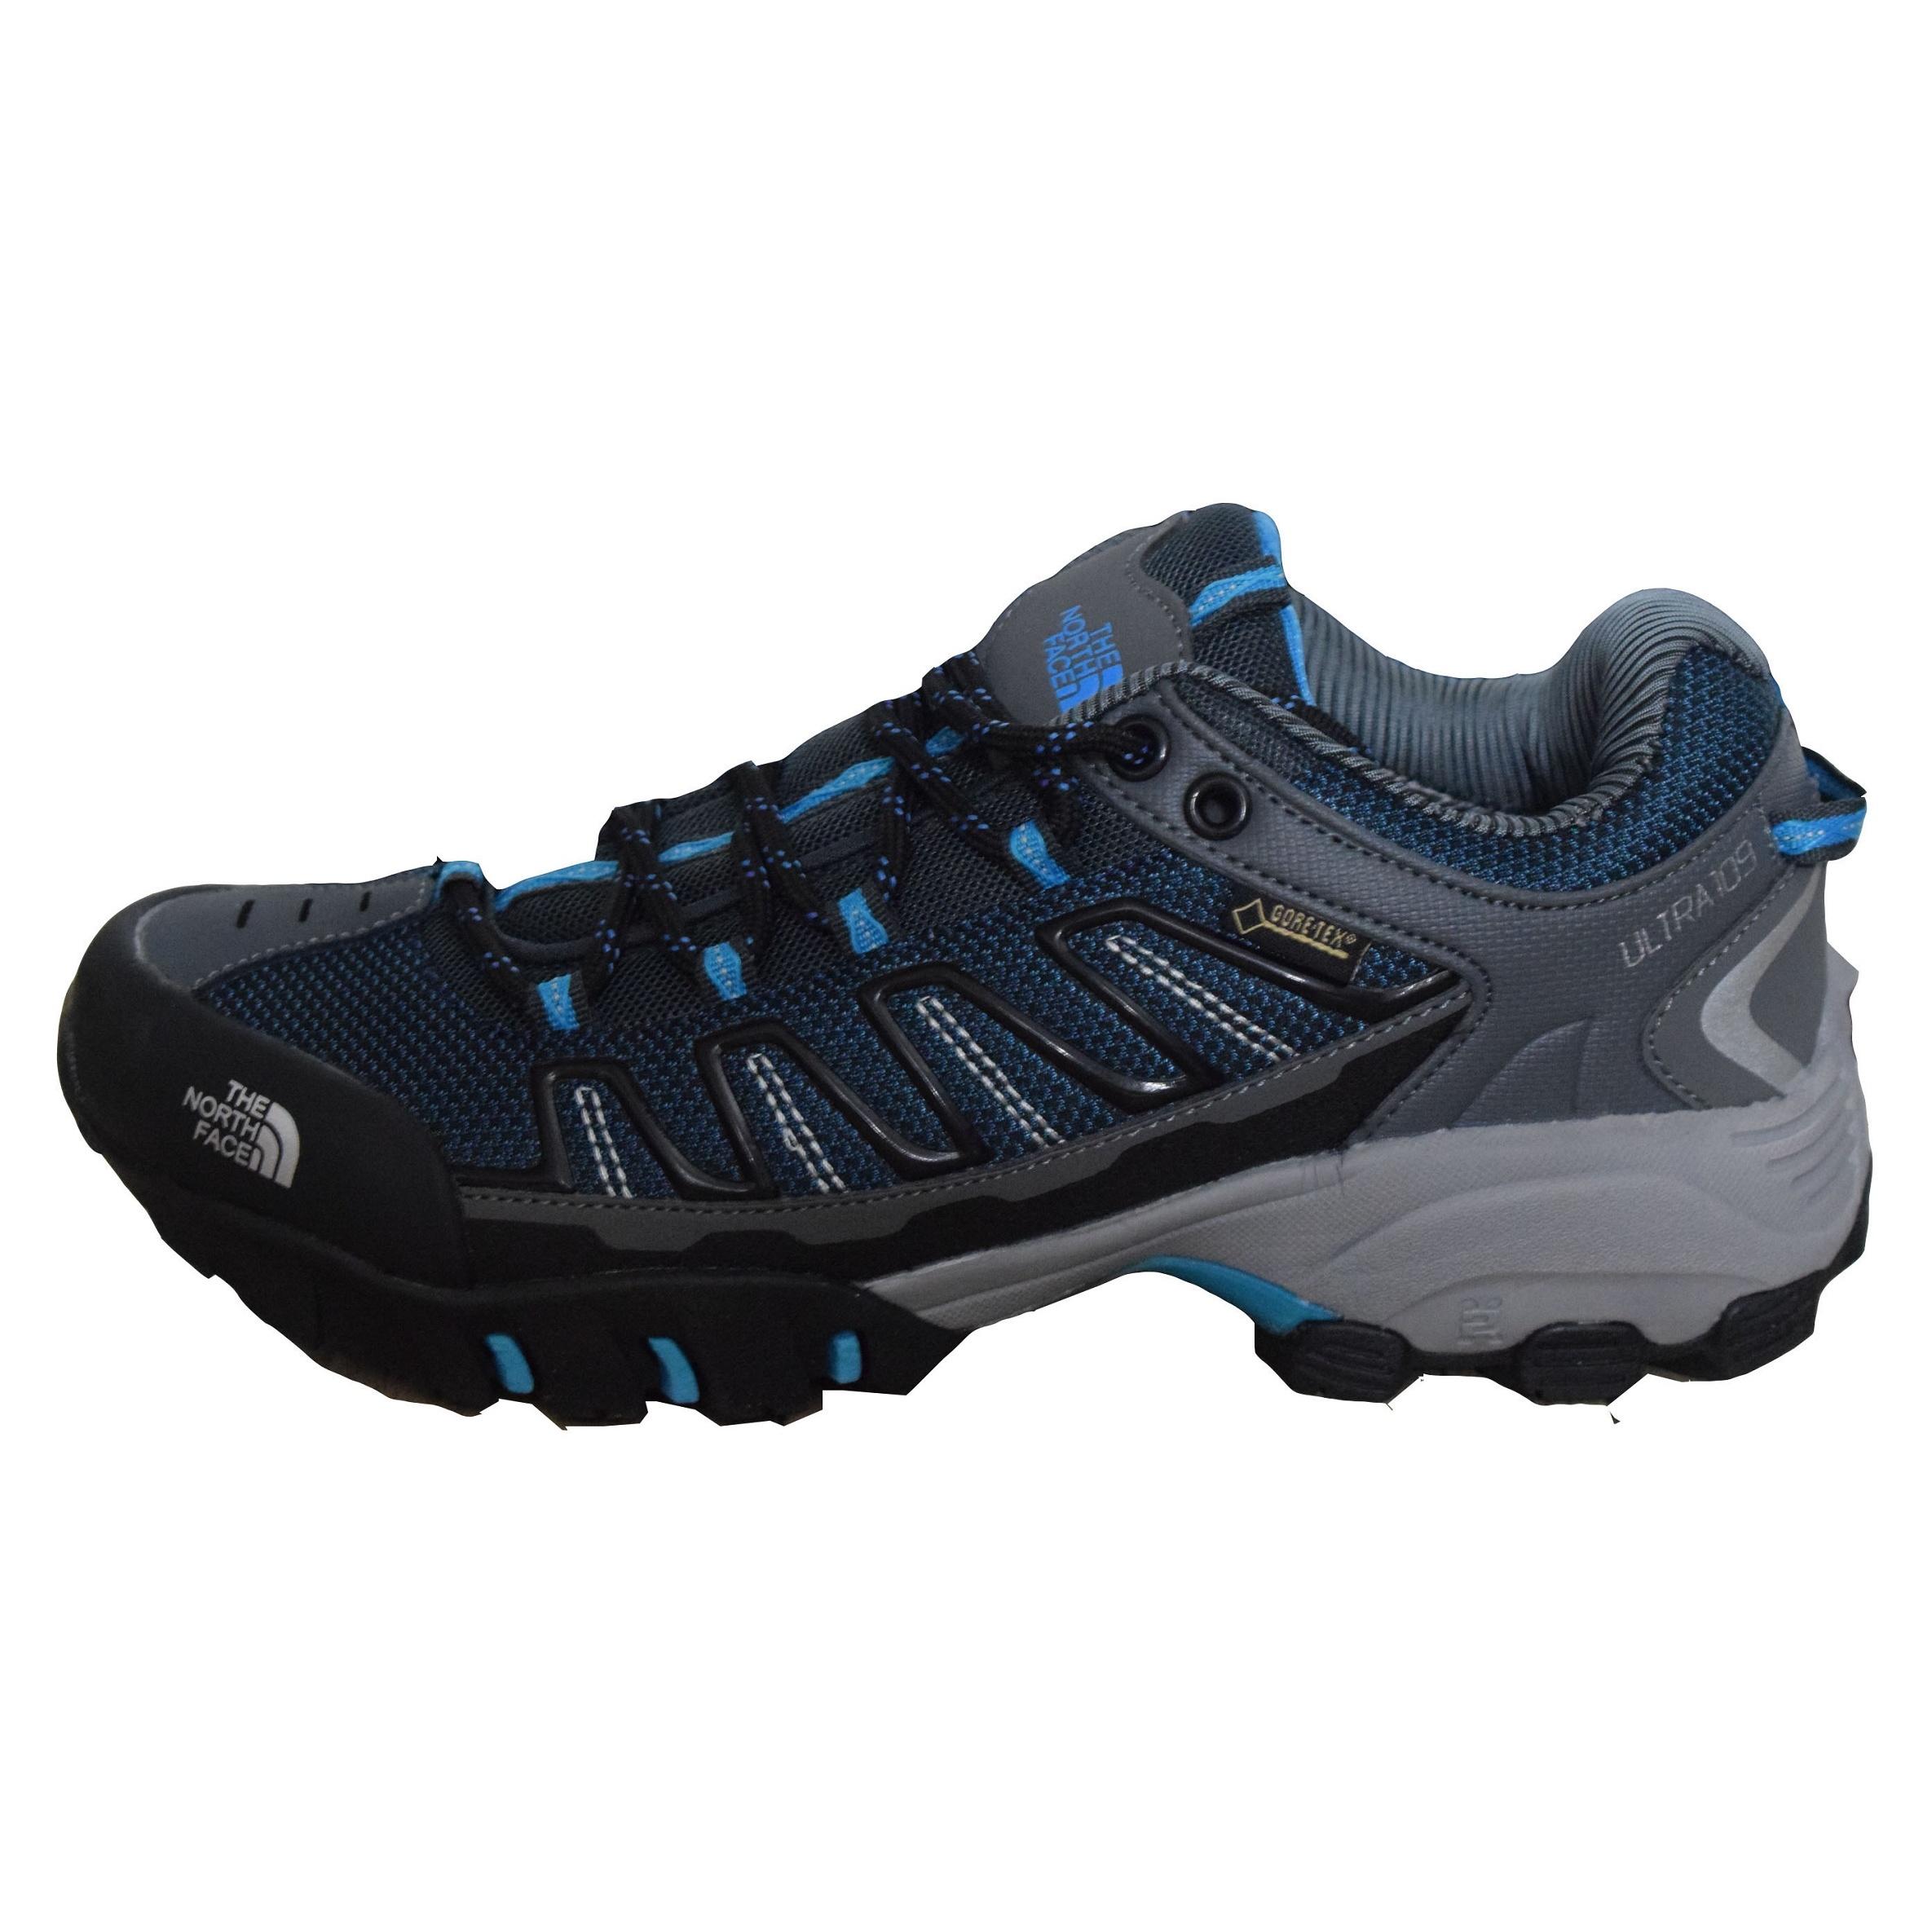 کفش پیاده روی زنانه نورث فیس مدل Ultra 109 GTX Trail Runner